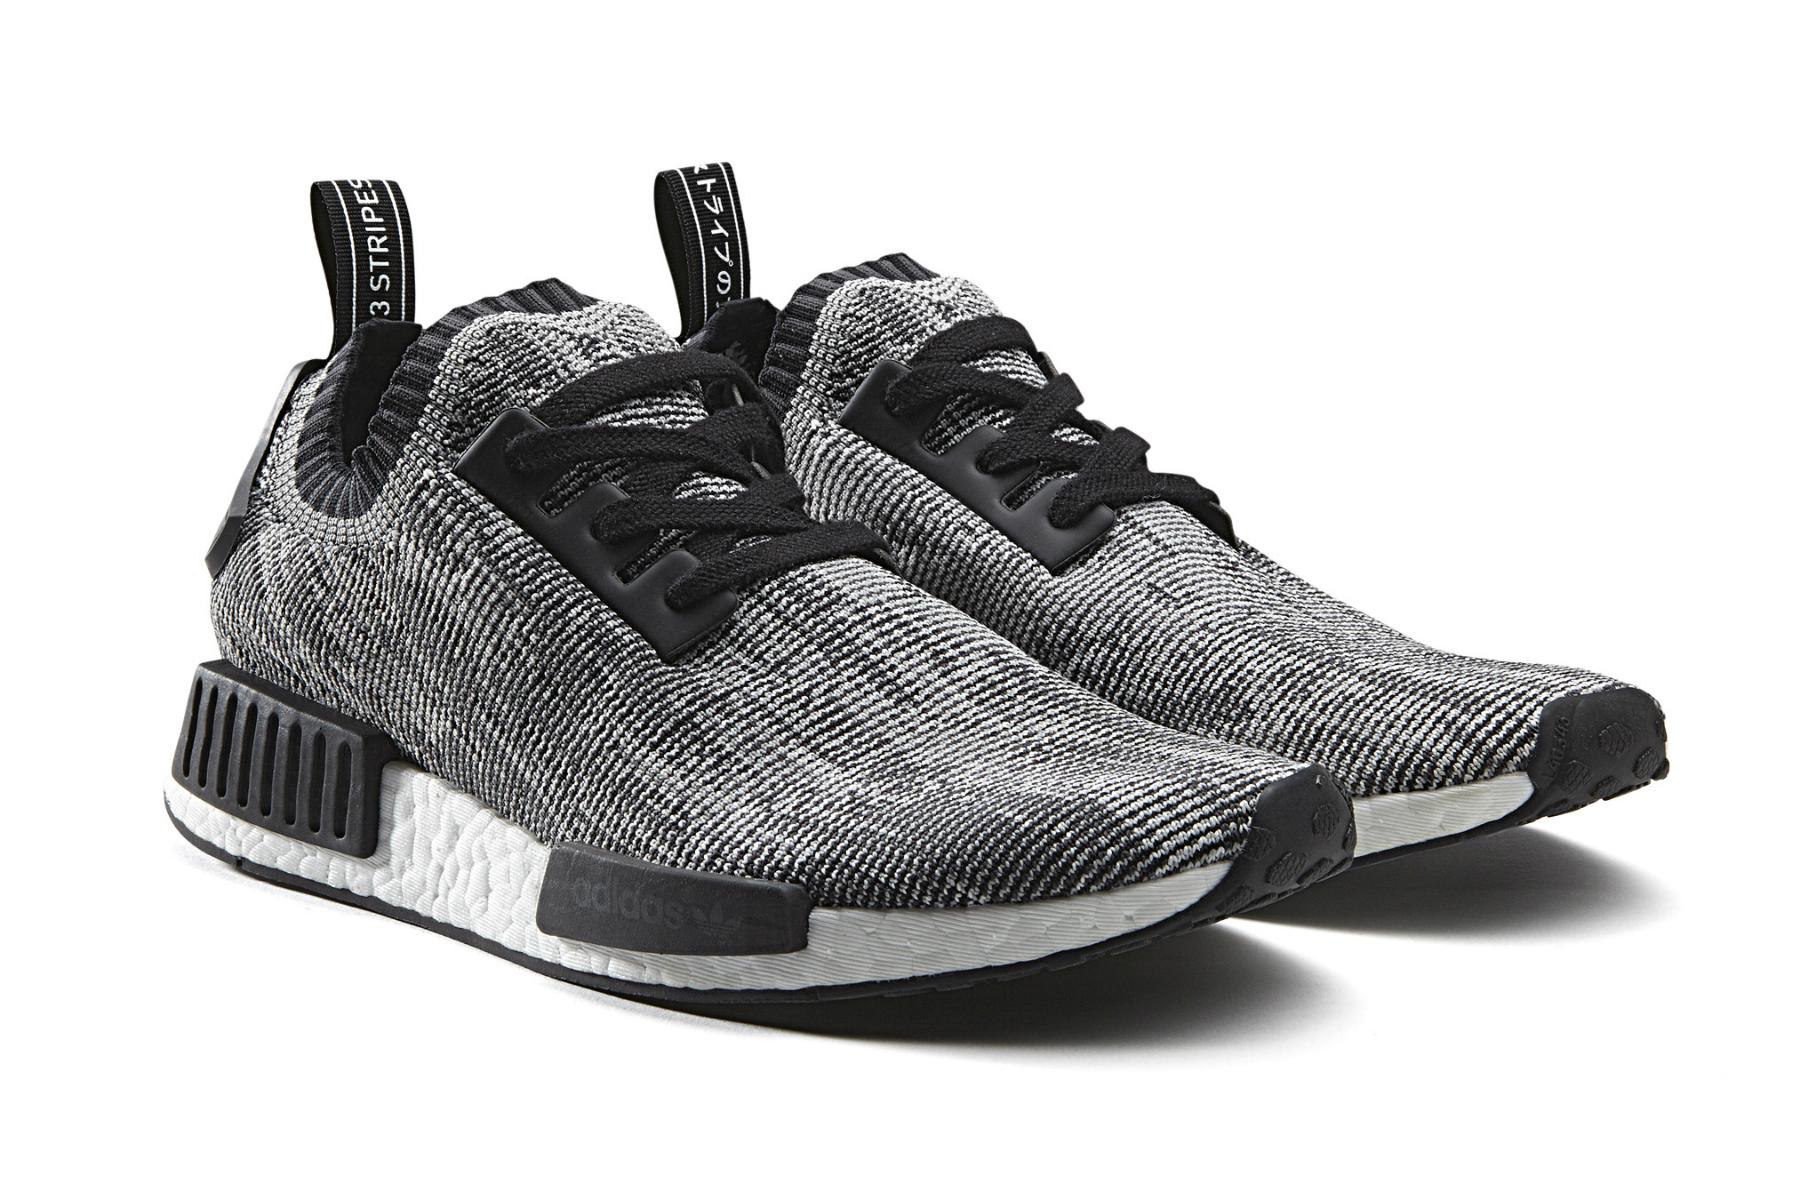 kanye west adidas shoes adidas nmd primeknit r1. Adidas yeezy ...